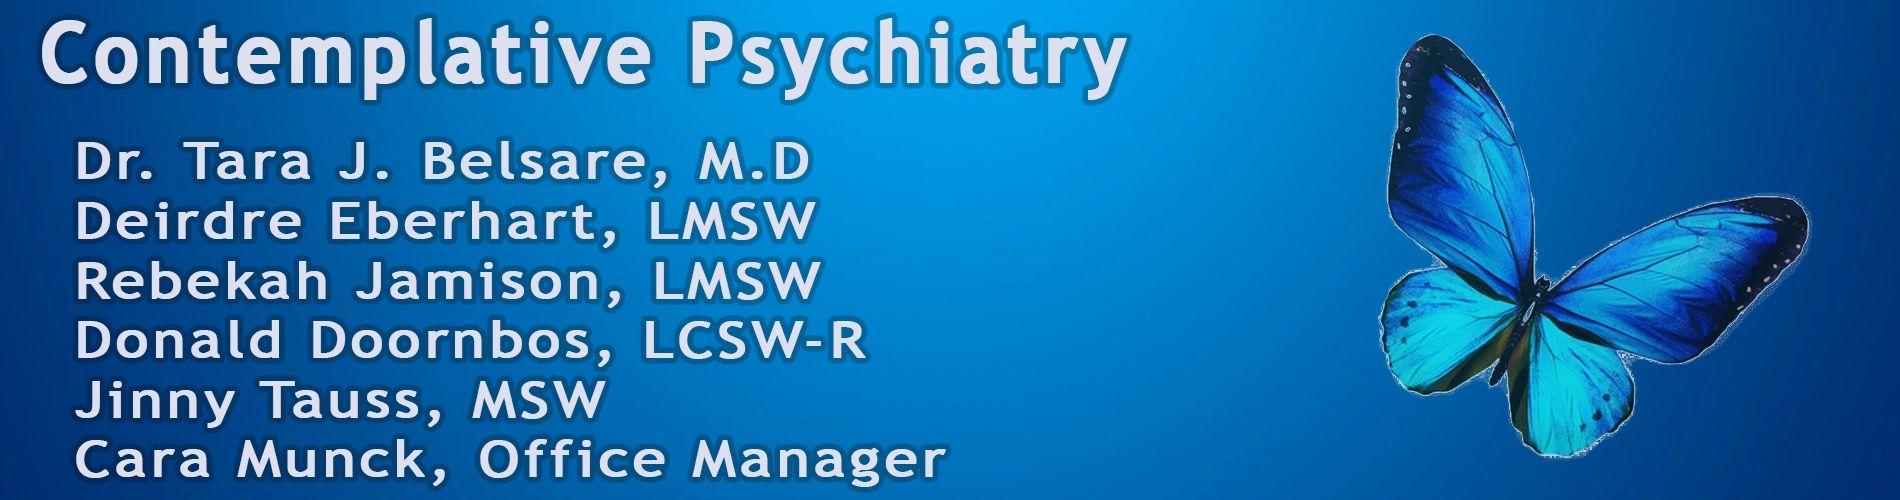 About Contemplative Psychiatry Dr Tara Belsare